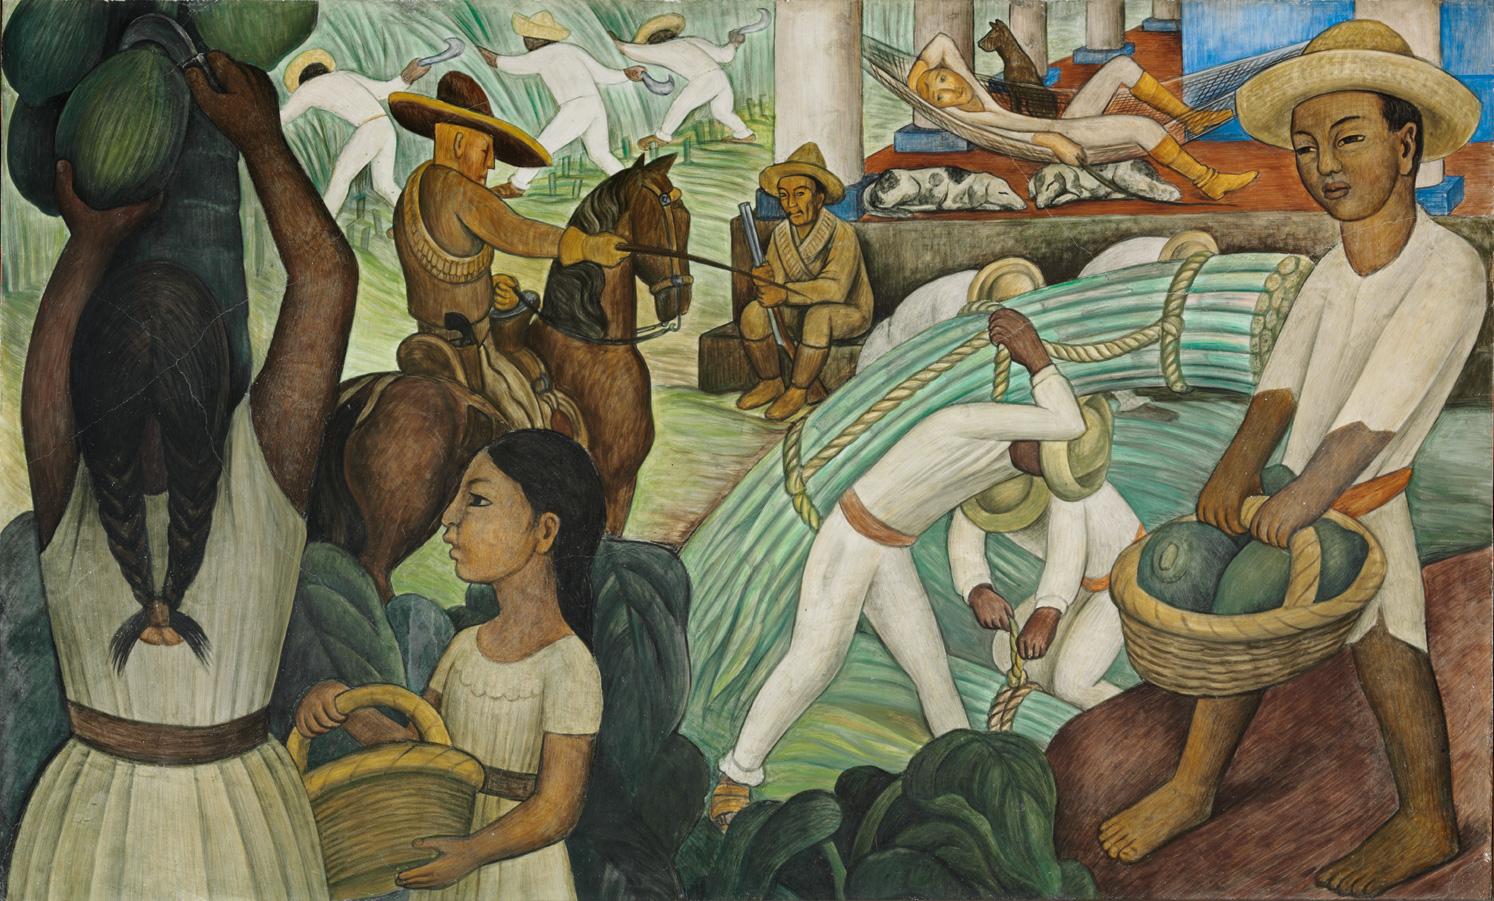 - Diego Rivera (1886-1957), Sugar Cane, 1931, mural, Museum of Modern Art, fresco on concrete